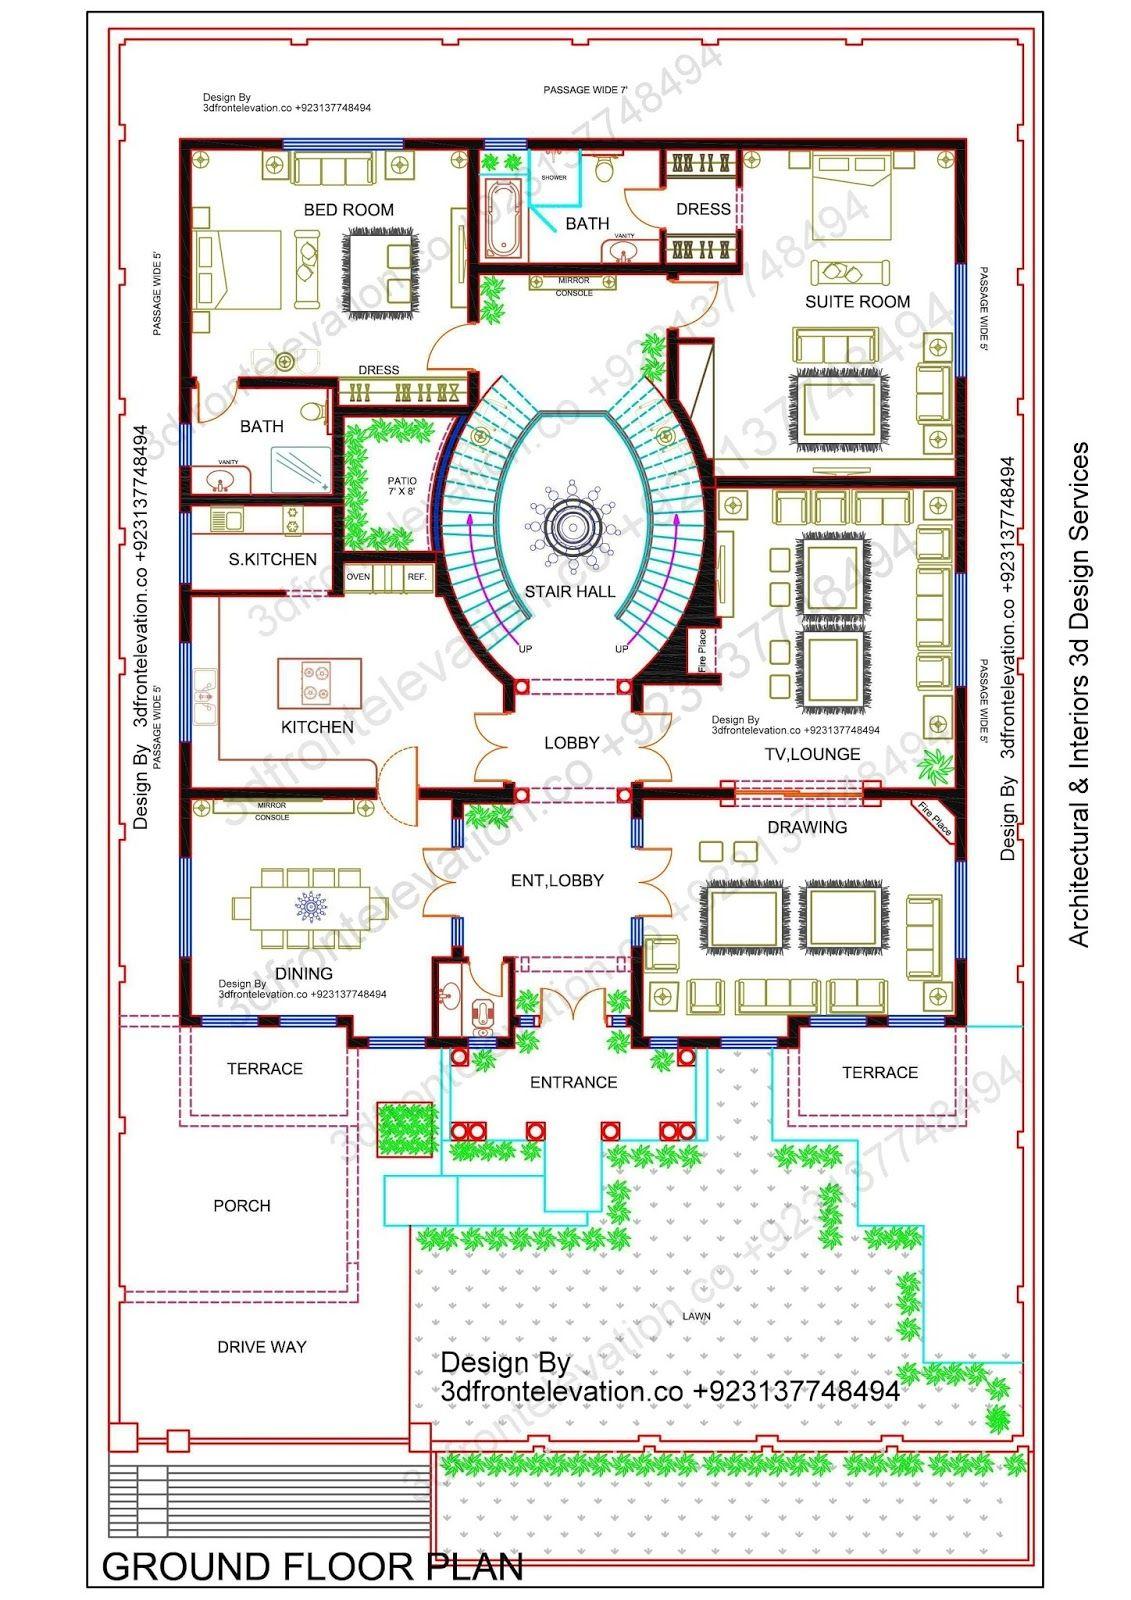 Beautiful Big Corner House Plan Design With Basement Pakistan India Saudi Arabia Afghanistan Dubai Best House Plans House Plans How To Plan